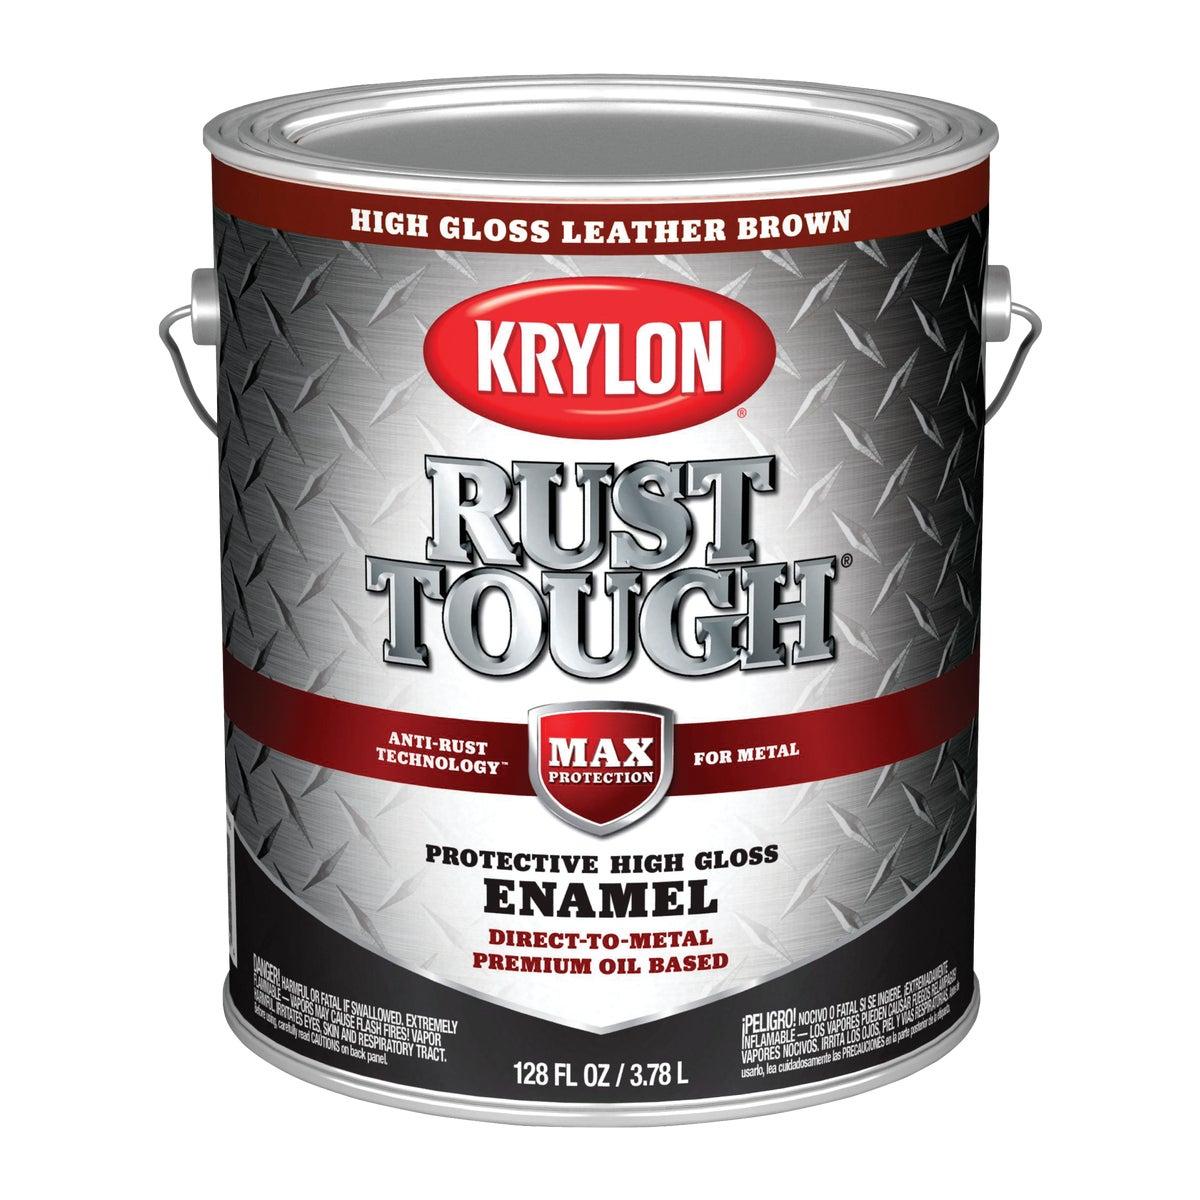 GLS BROWN RUST ENAMEL - 044.0021833.007 by Valspar Corp